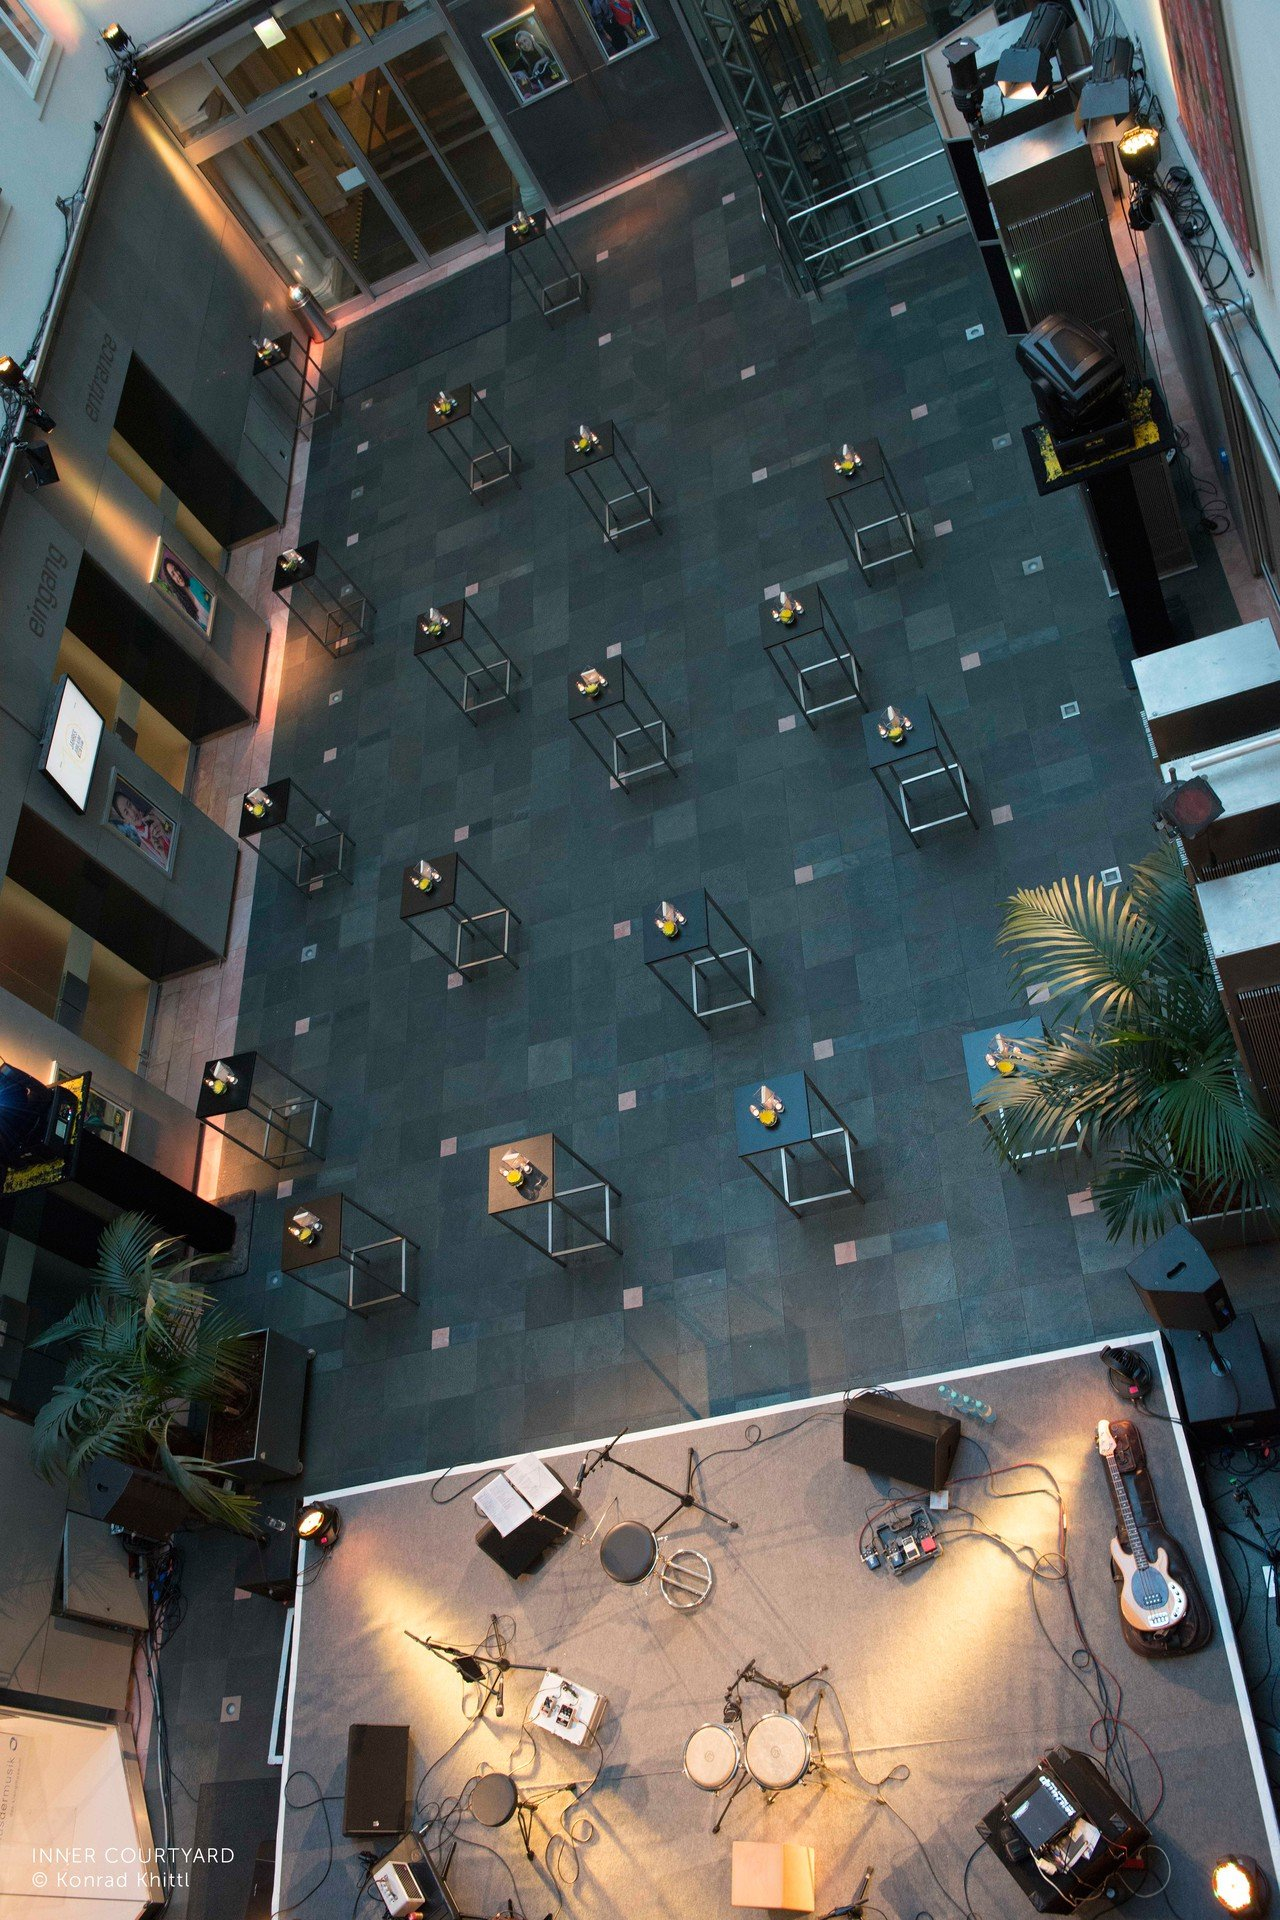 Vienna workshop spaces Patio / Cour extérieure Haus der Musik - Inner Courtyard image 2